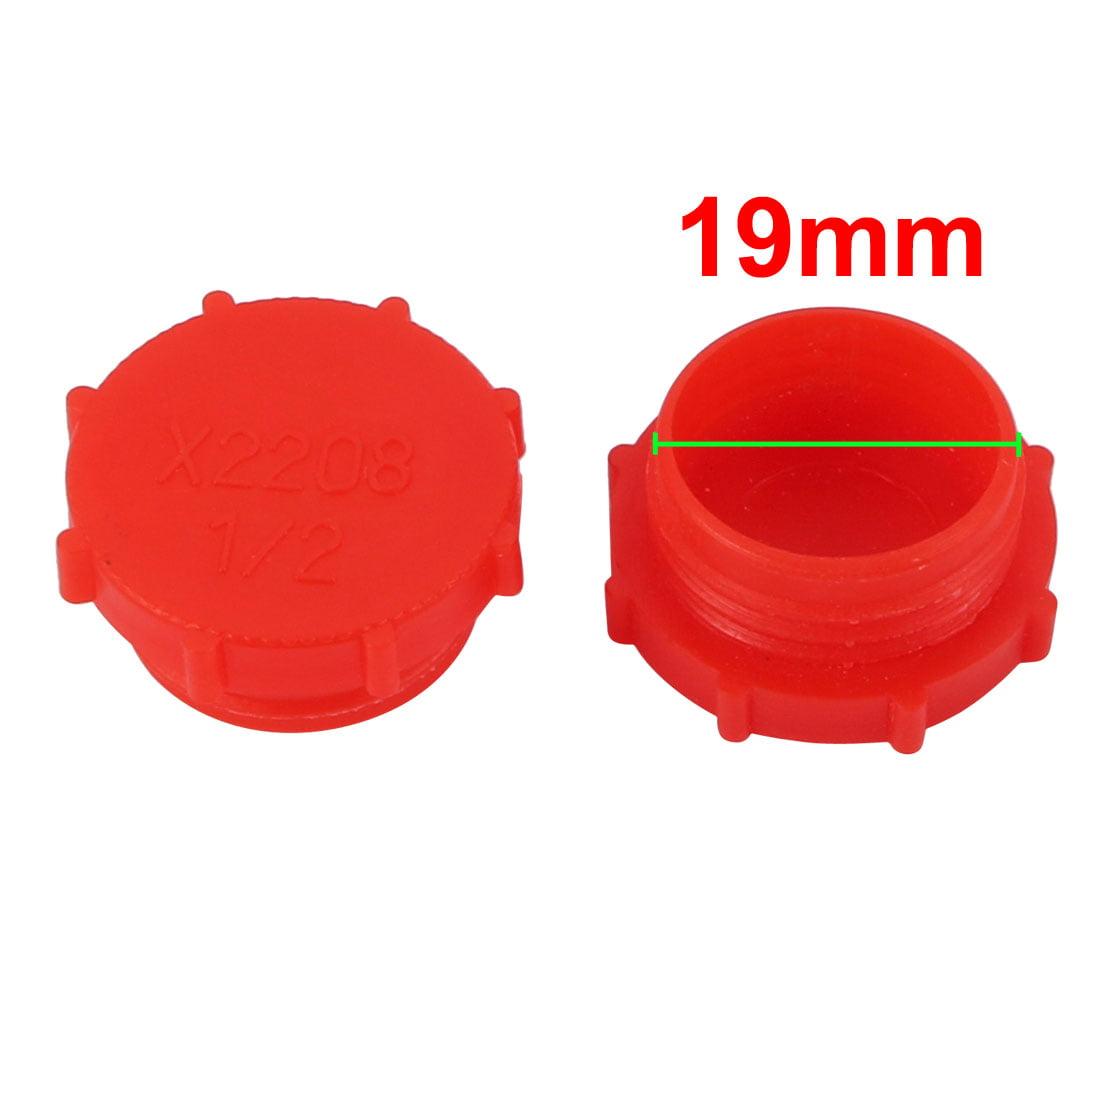 100pcs G1/2 PE External Threaded Tube Insert Cap Screw-in Cover Red - image 1 of 2